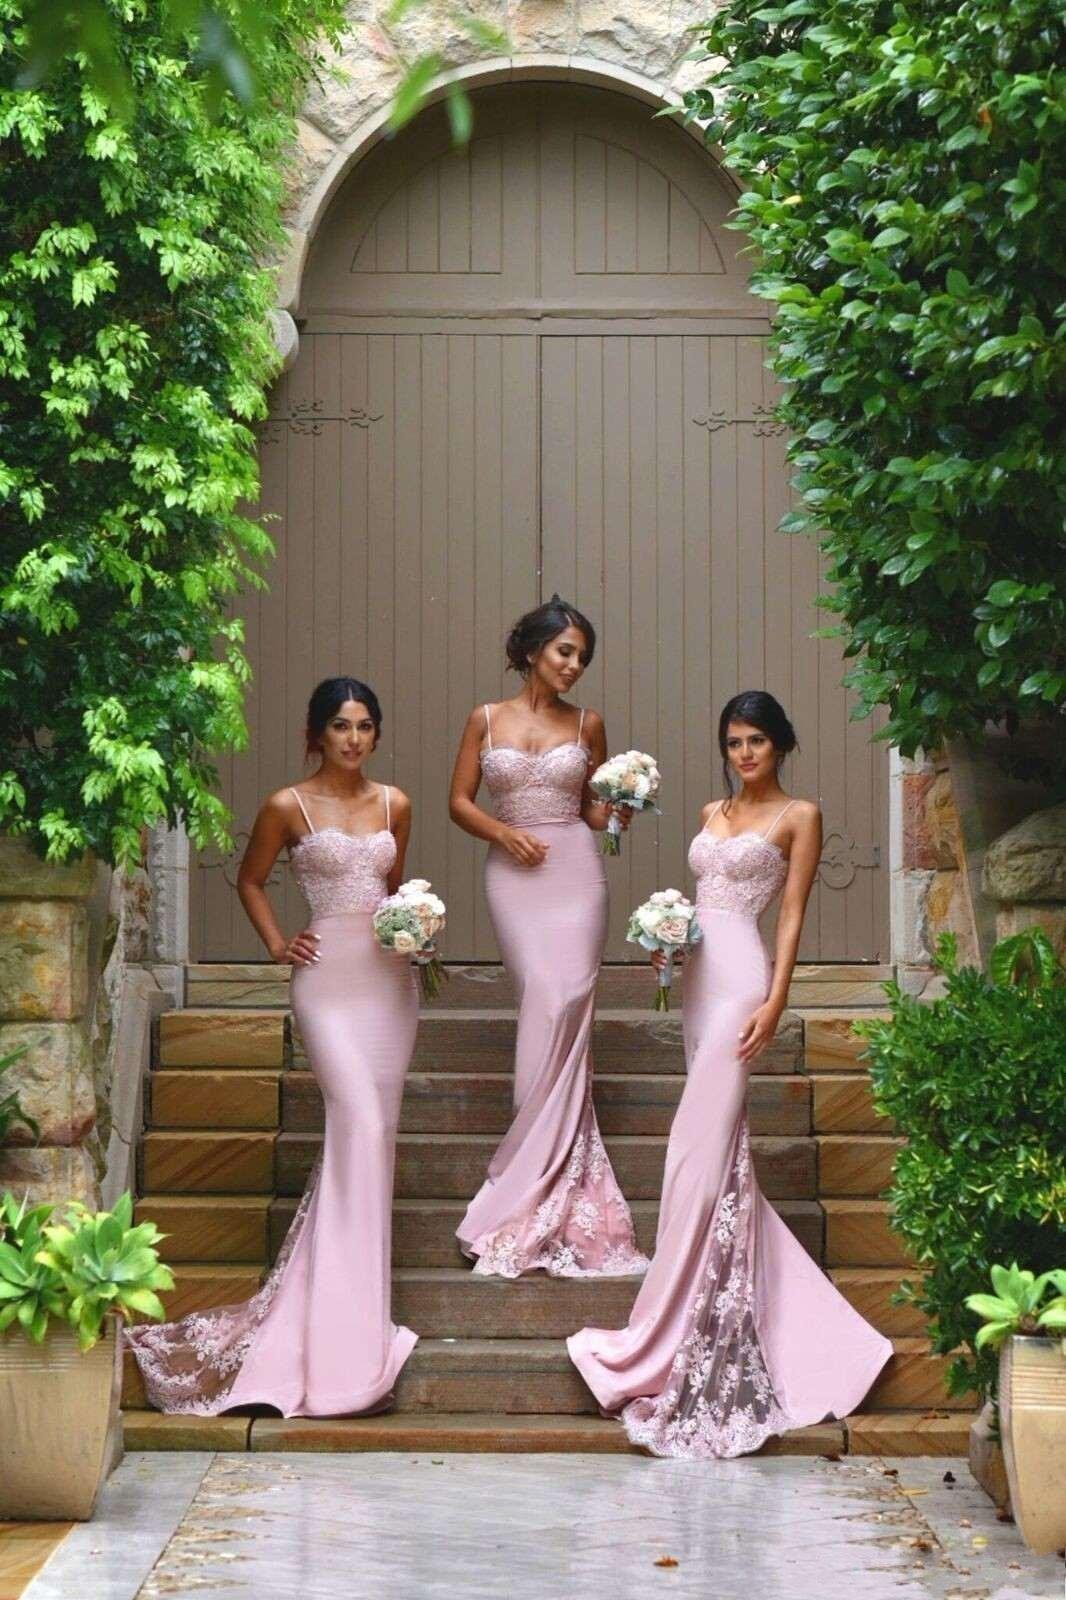 2020 Blush Pink Bridesmaid Dresses Spaghetti Strap Sleeveless Mermaid Lace Junior Country Bridesmaid Dresses Long Maid Of Honor Dress